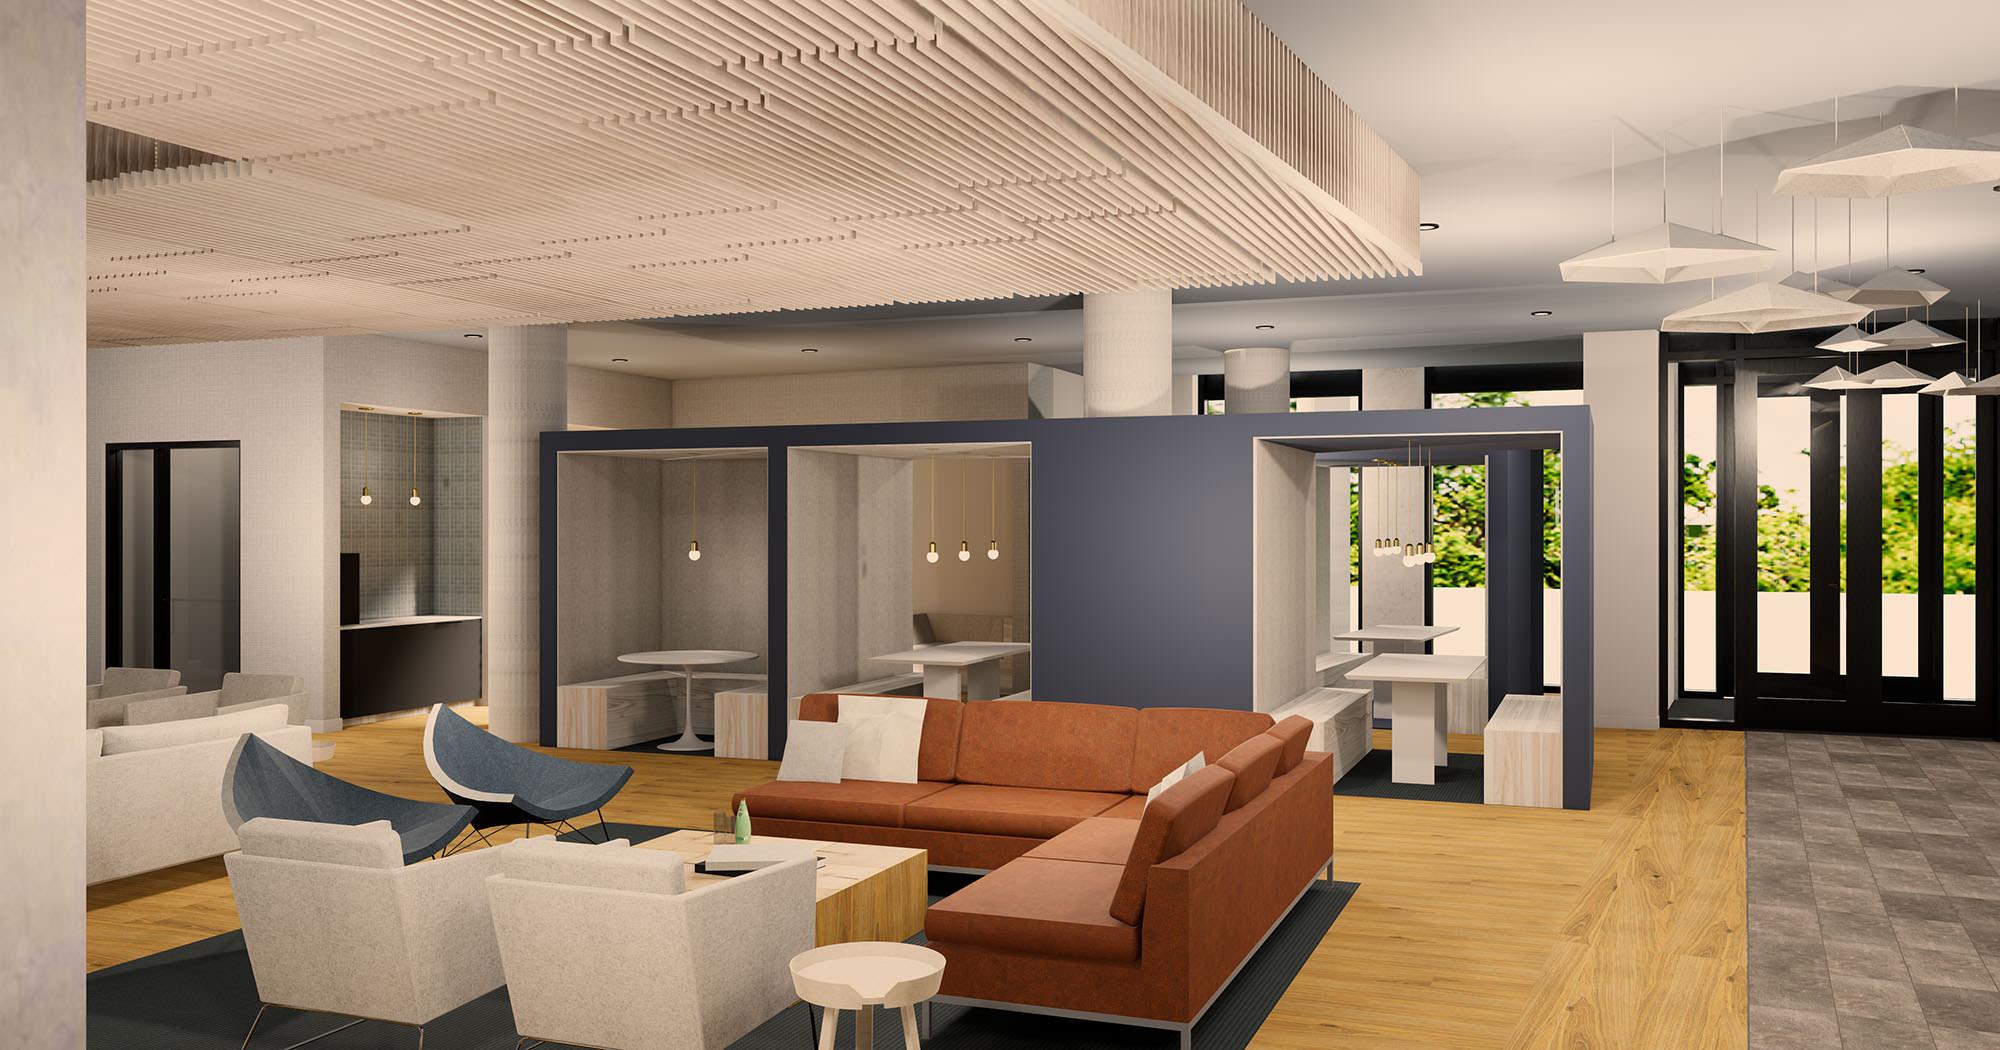 Trailside Student Housing Interior Design